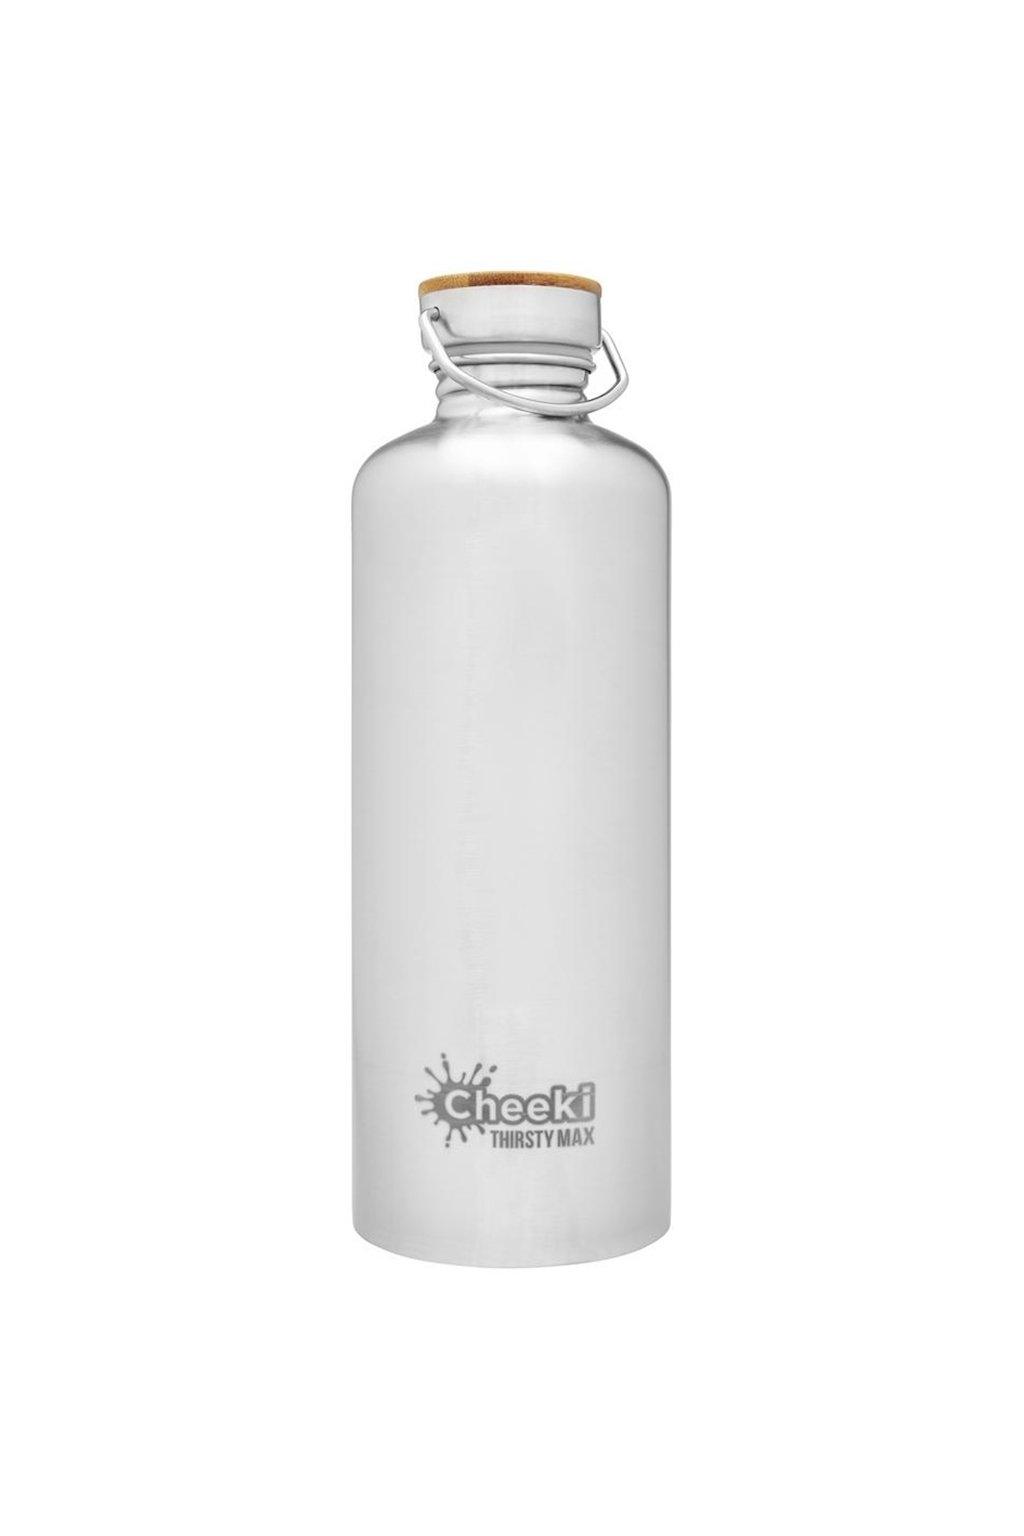 Outdoorová láhev Cheeki Thirsty Max 1,6 L